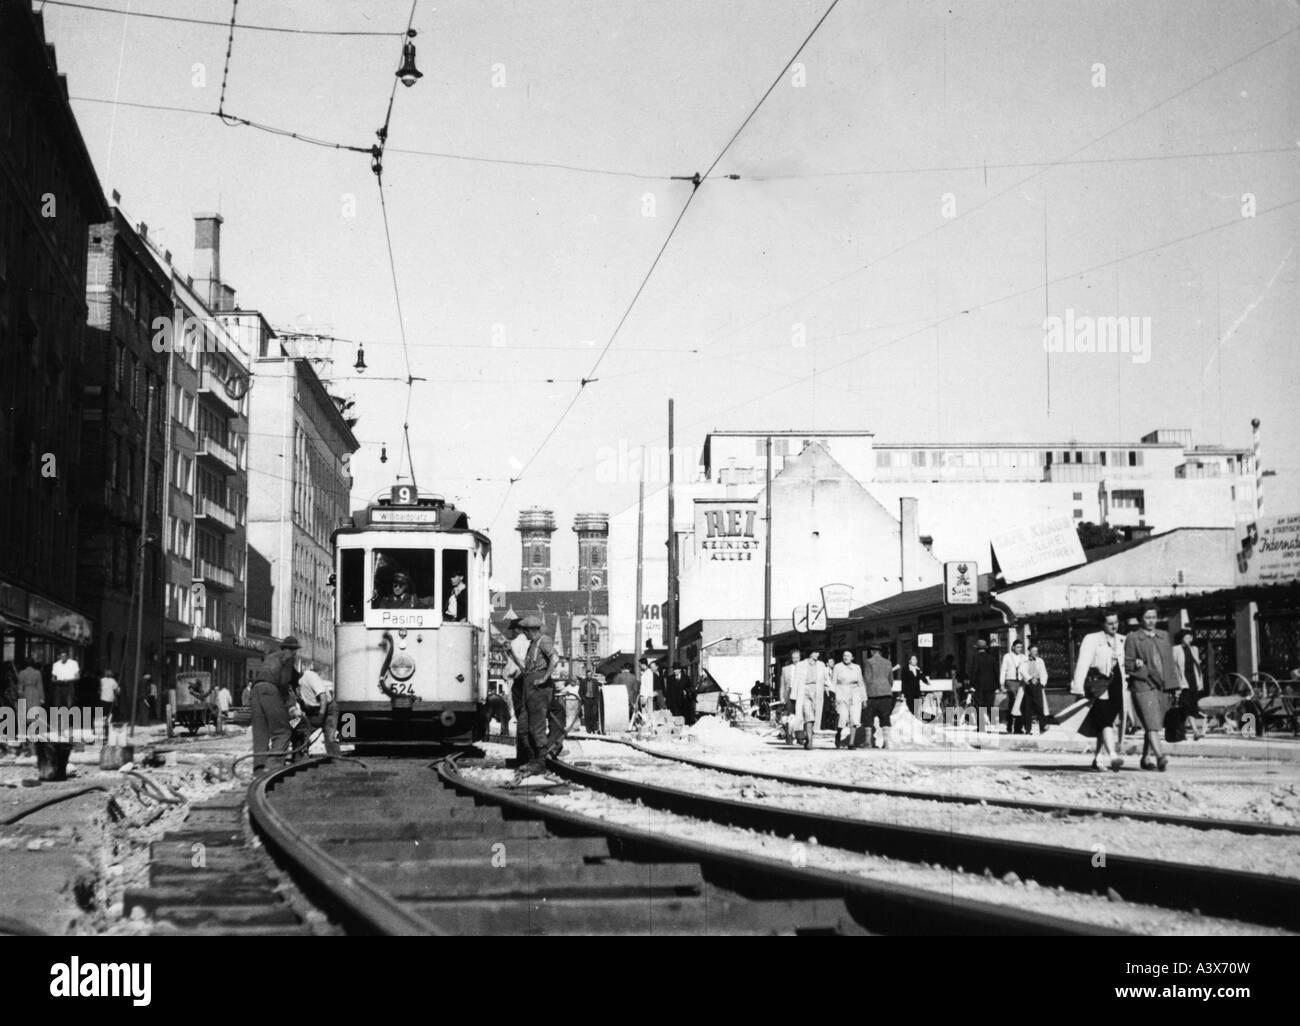 events, post-war period, destroyed cities, Munich, Bayer Street, circa 1947, streetcar, construction, reconstruction, - Stock Image